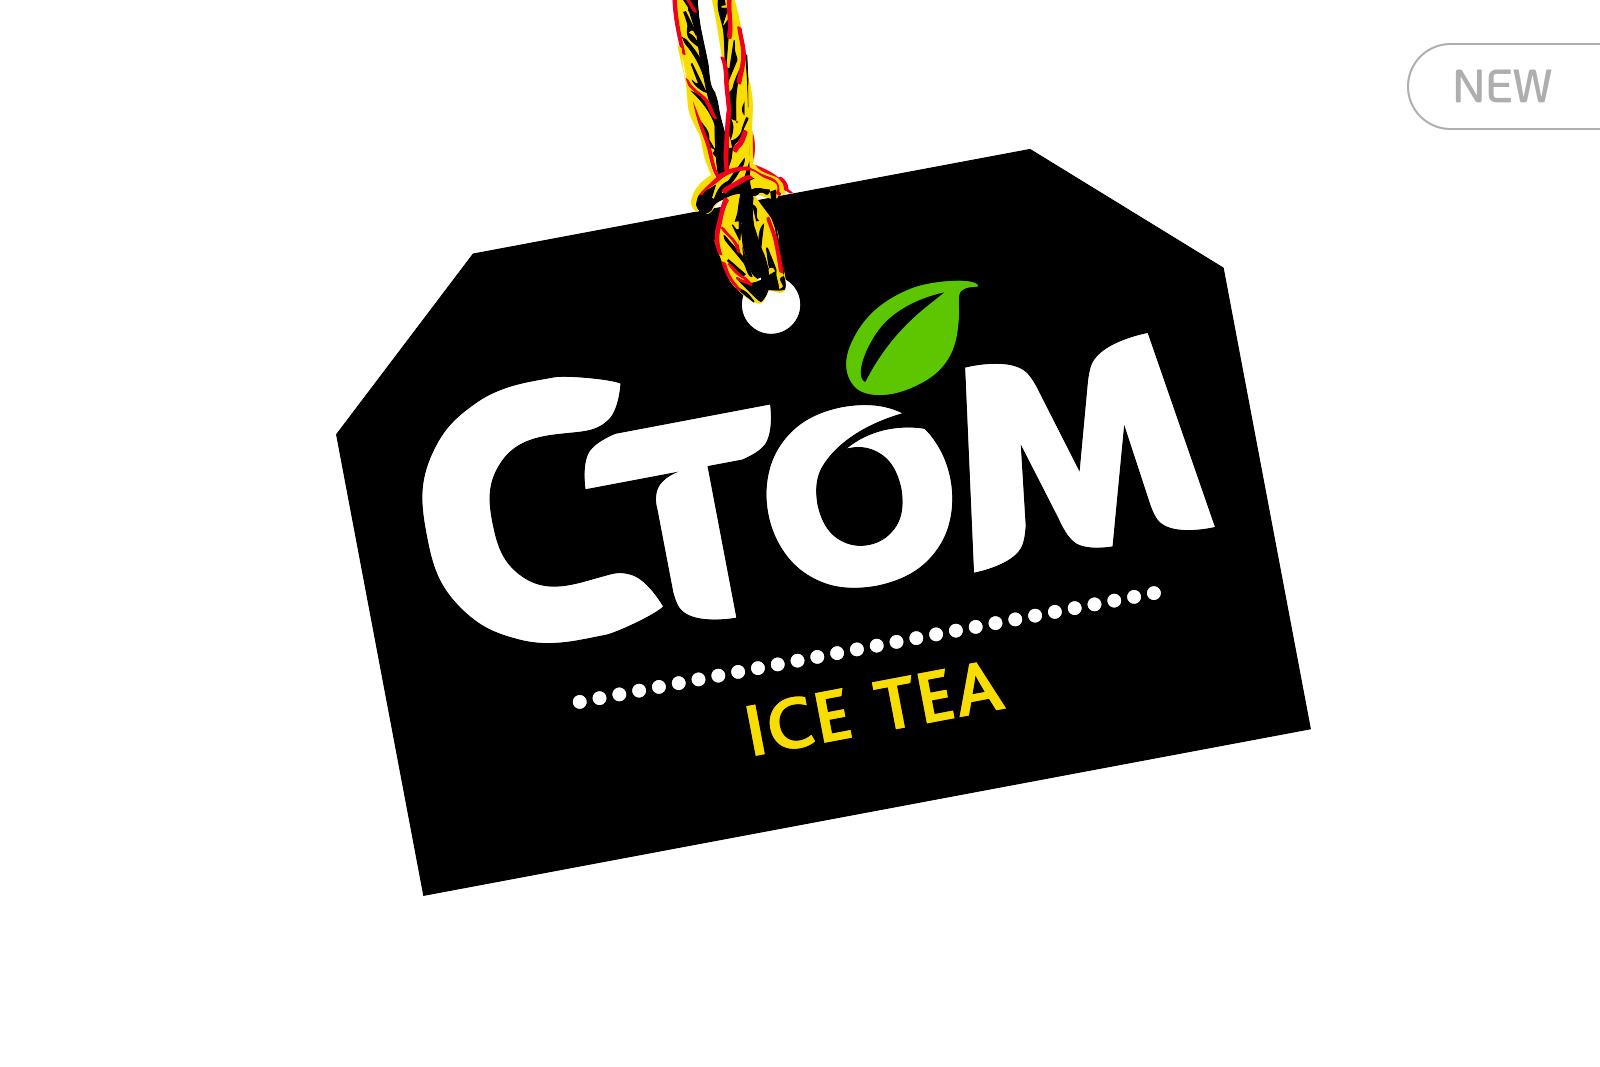 Redesign, rebranding, trade mark, logo design, ice tea, Asgard Branding, black label